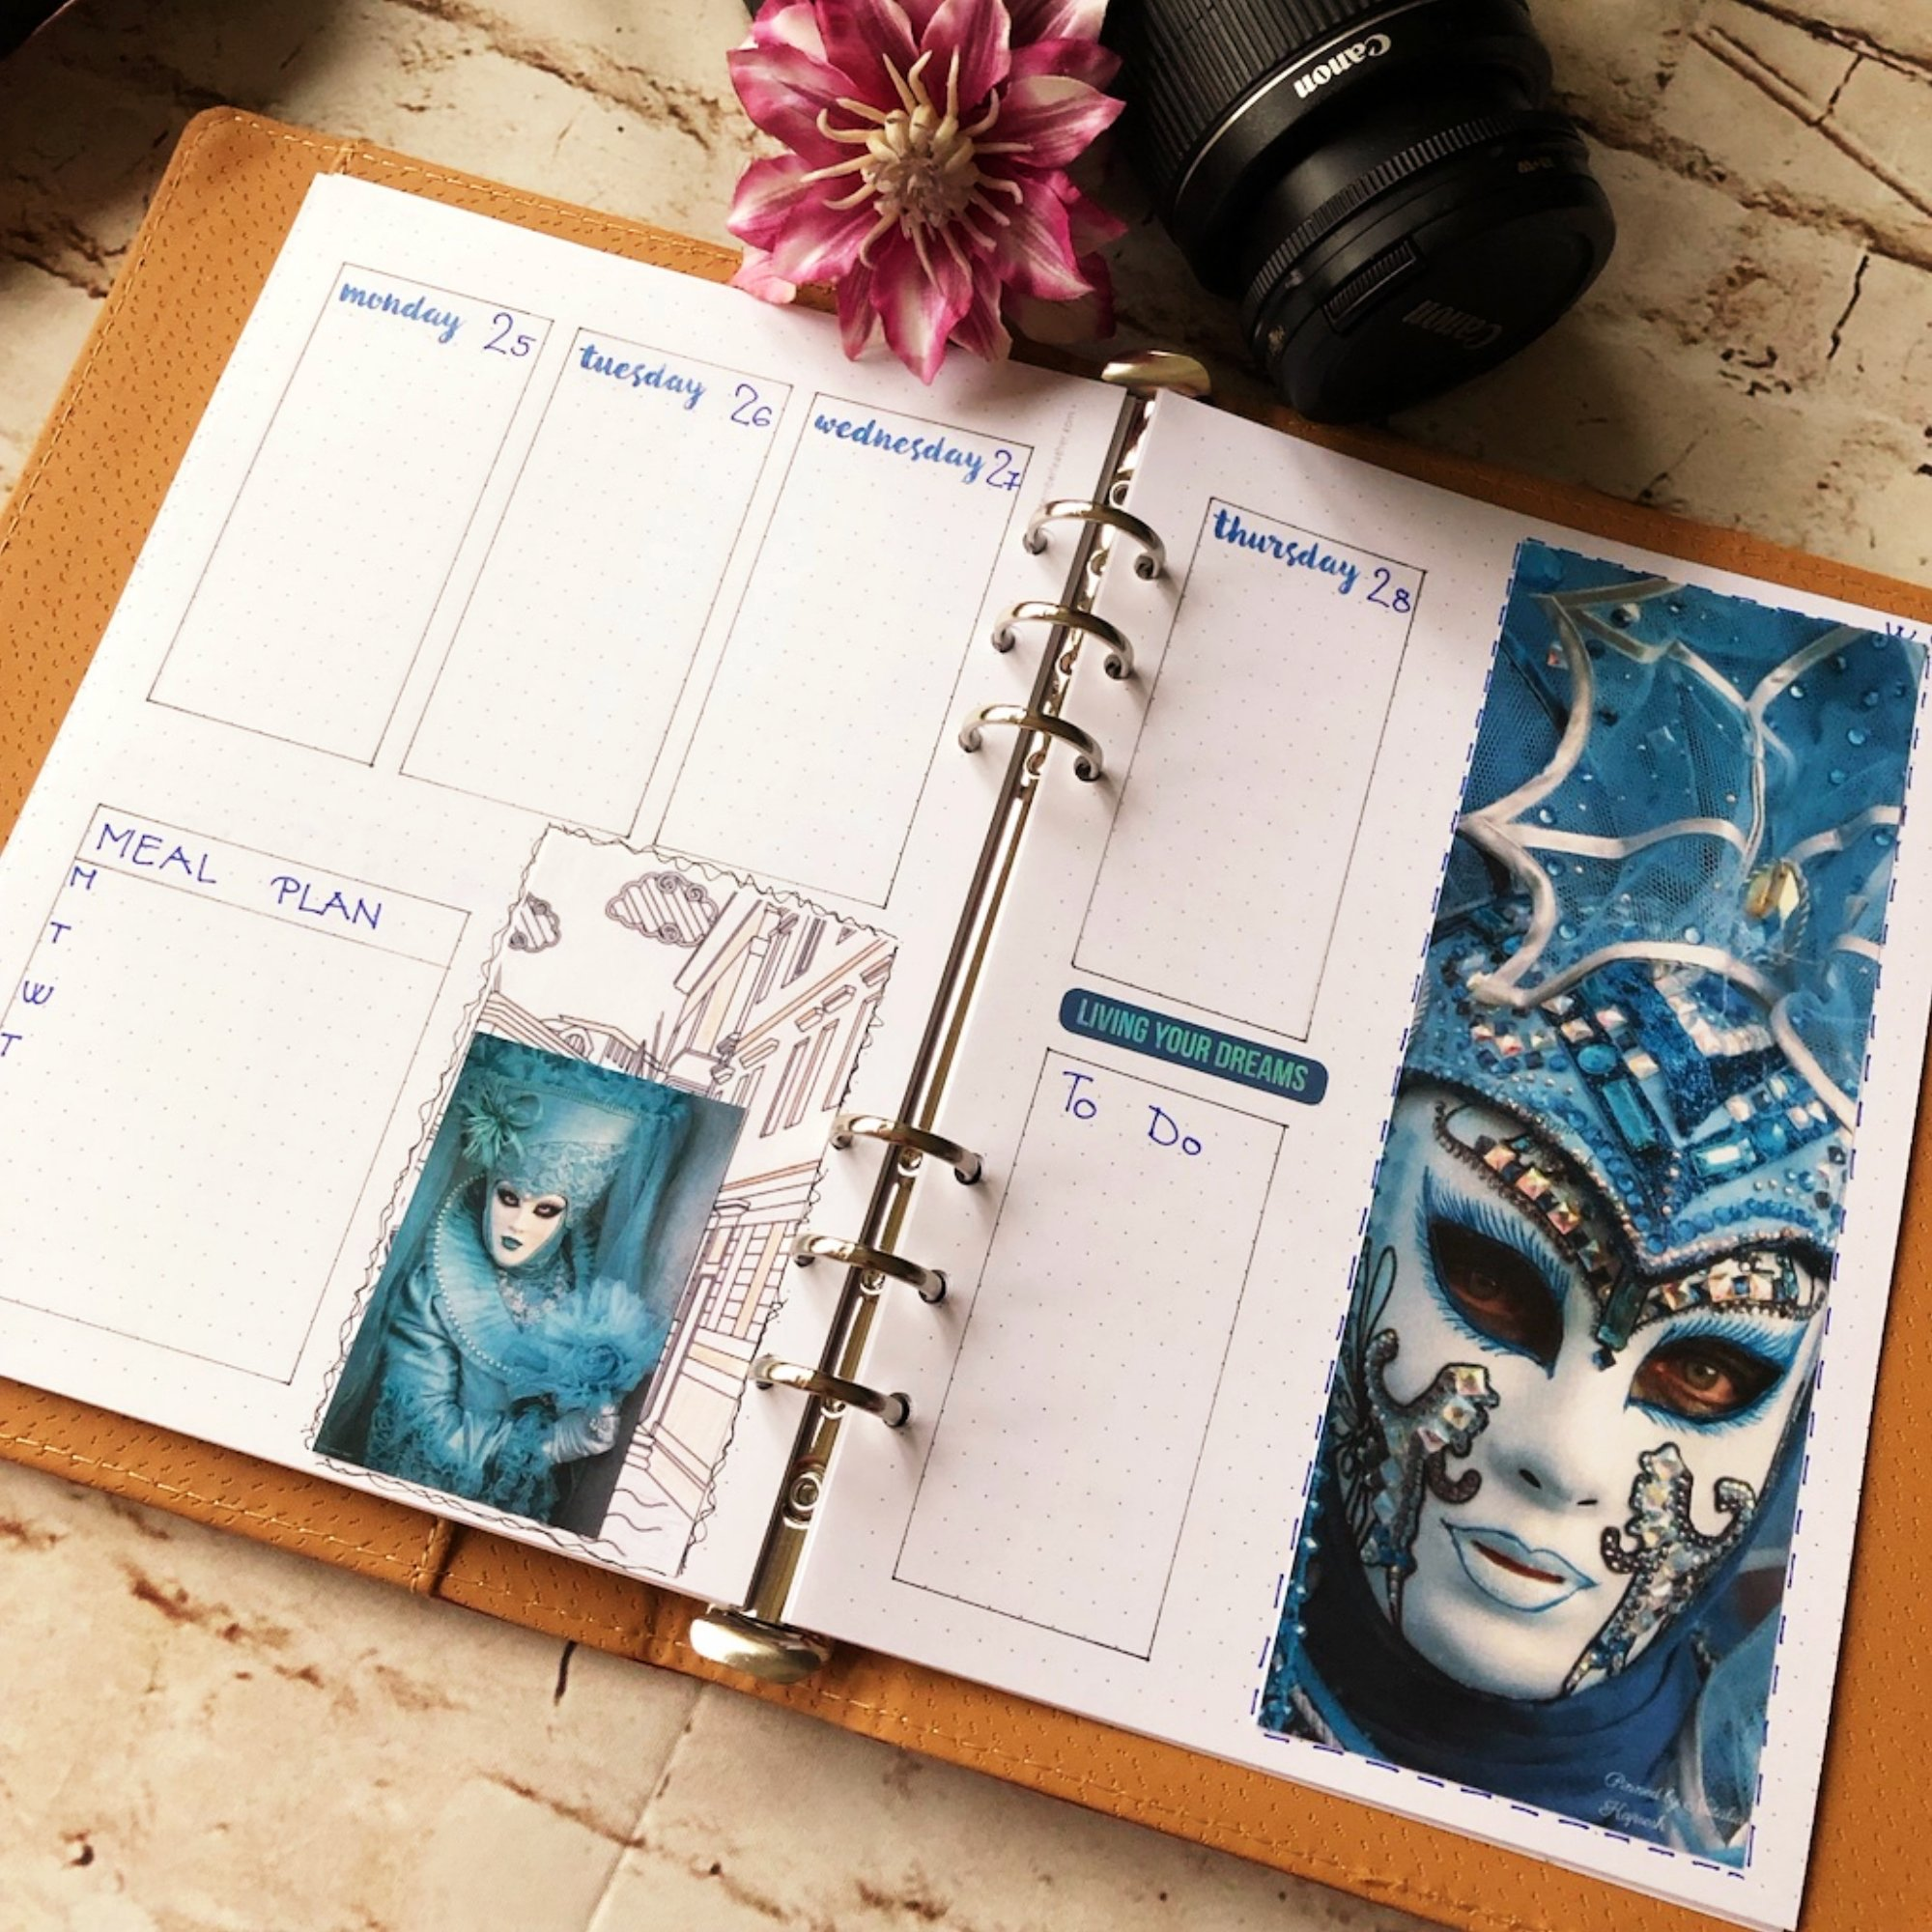 Creative journaling weekly planner - week 9 - itstartswithacoffee.com #creativejournaling #bulletjournaling #planner #weeklyplanner #weekly #February #2019 #week9